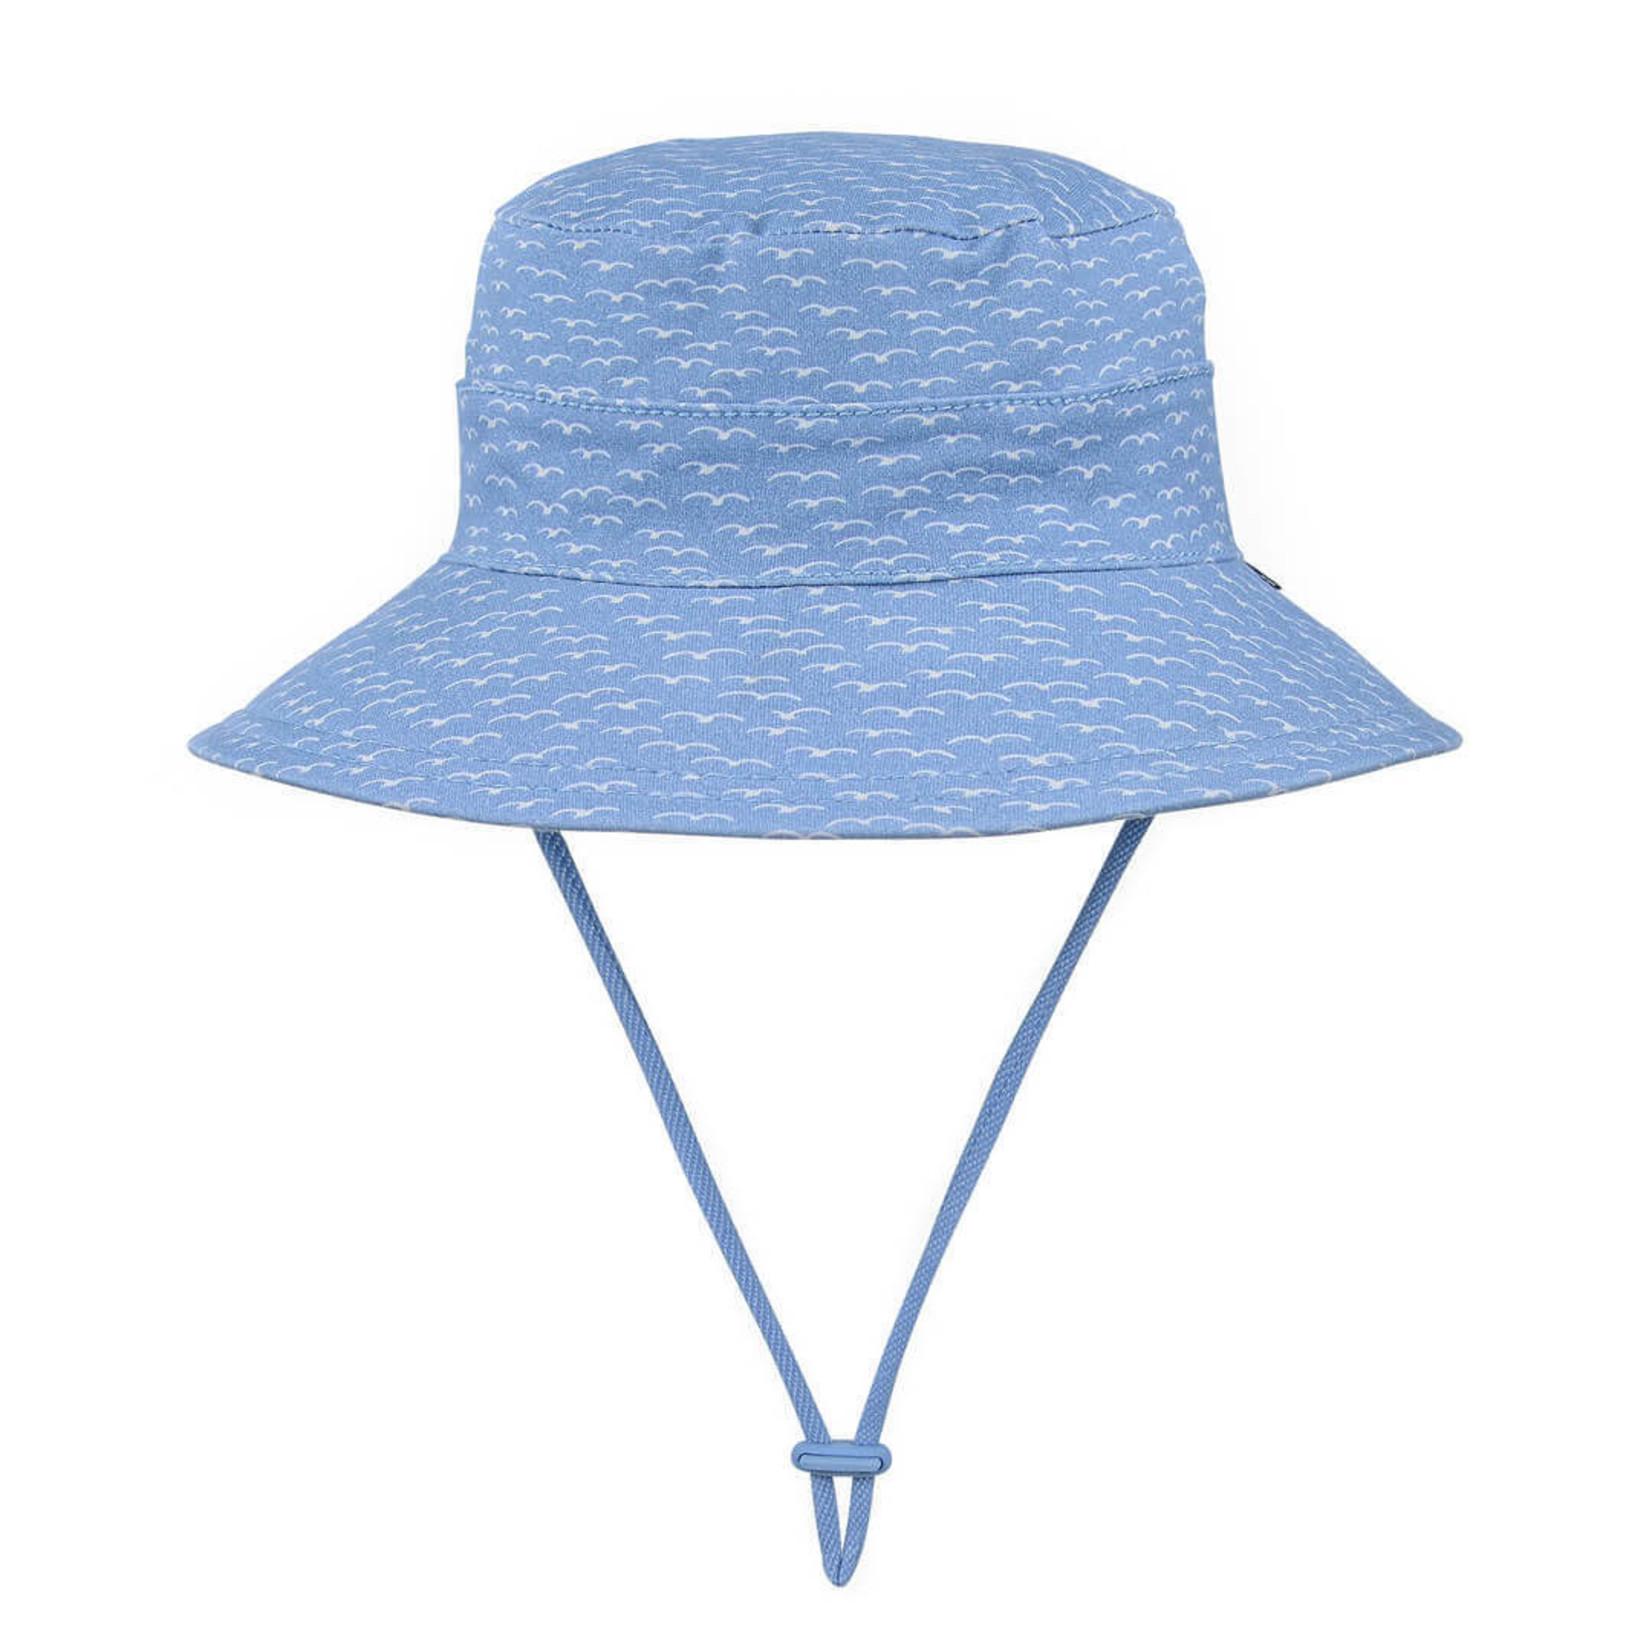 Bedhead Hats Bedhead Bucket Hat - Seagull